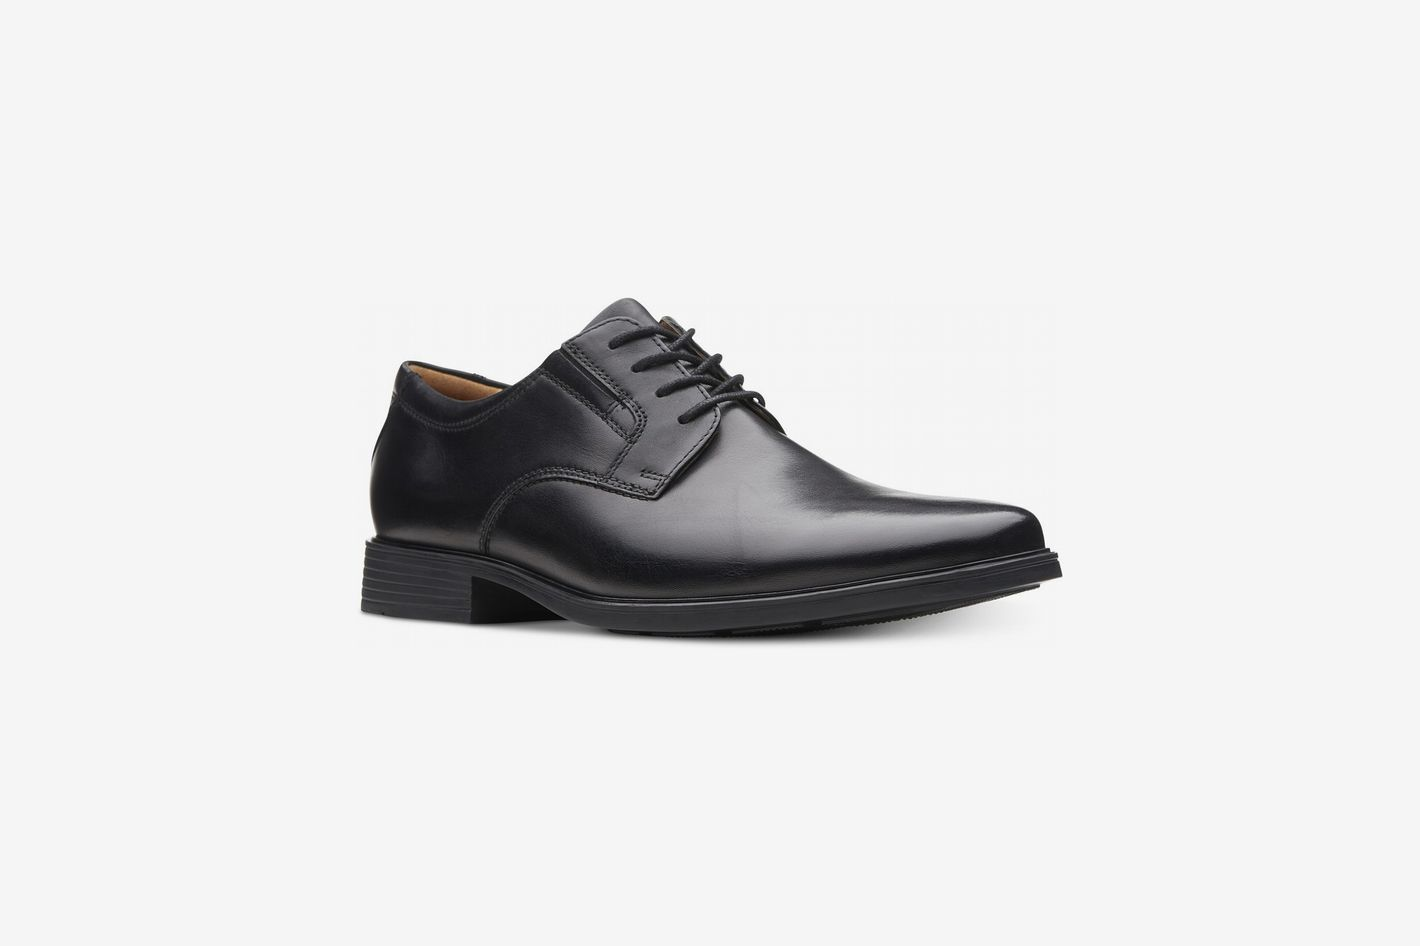 4c4121a5e Men s shoes. Clarks Men s Tilden Plain II Waterproof Dress Oxfords